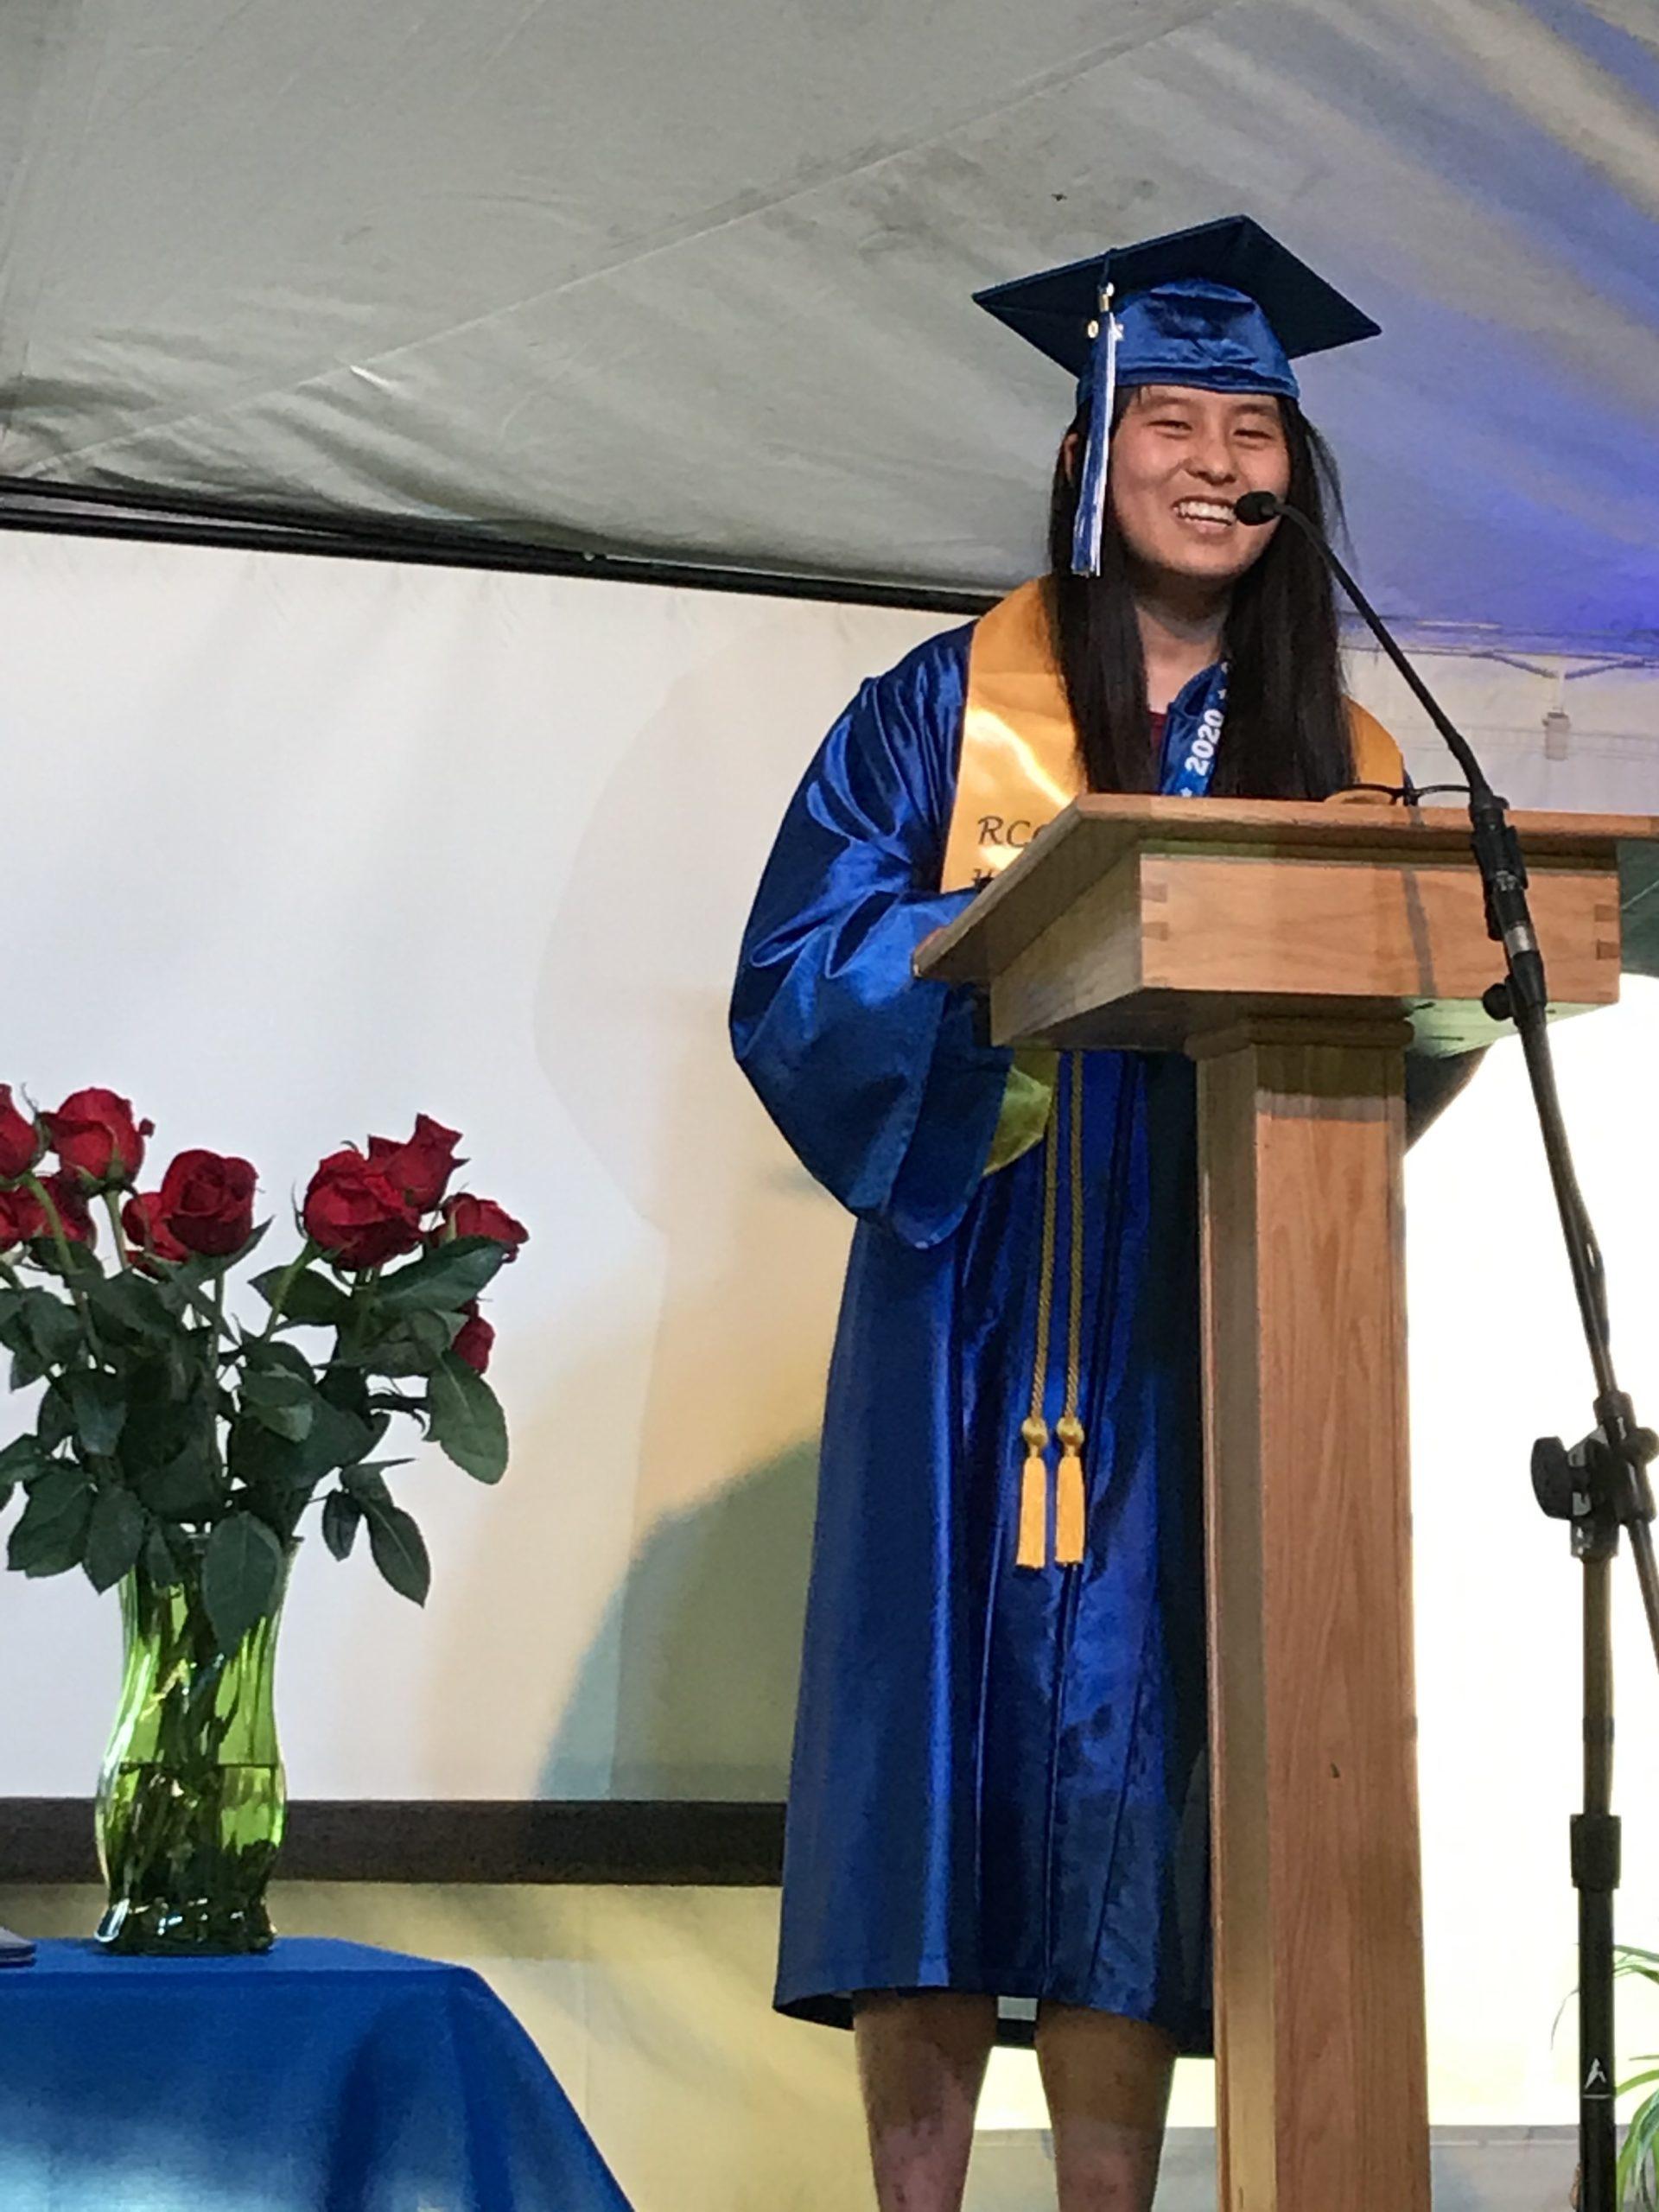 Ross Corners Christian Academy celebrates 60 years, honors graduates